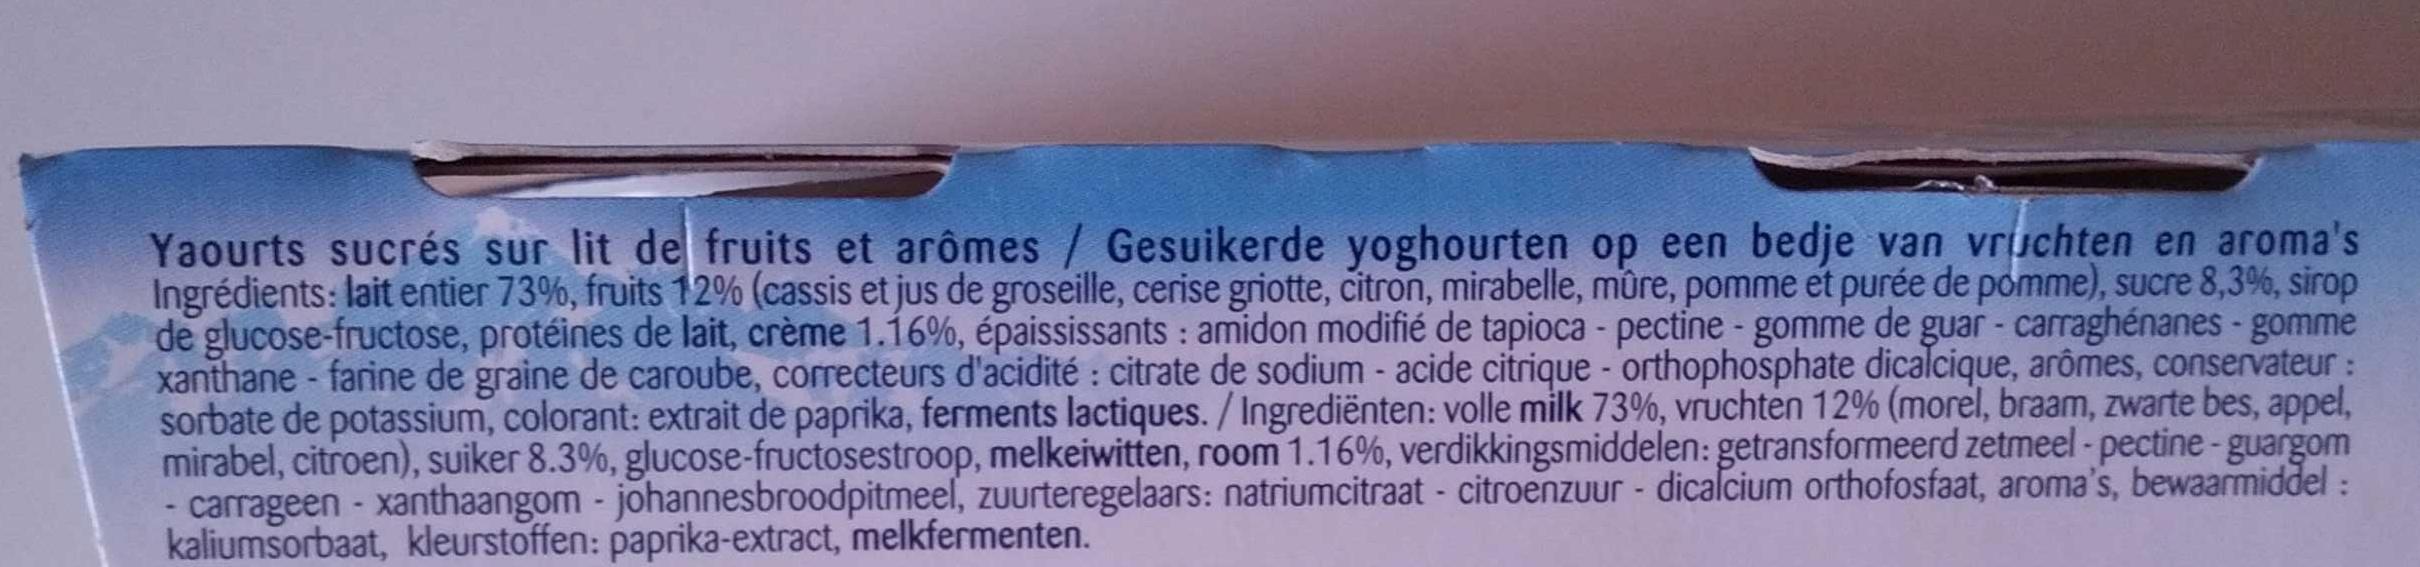 Corbeille de fruits : pomme-cerise-citron-mûre-mirabelle-cassis - Ingrediënten